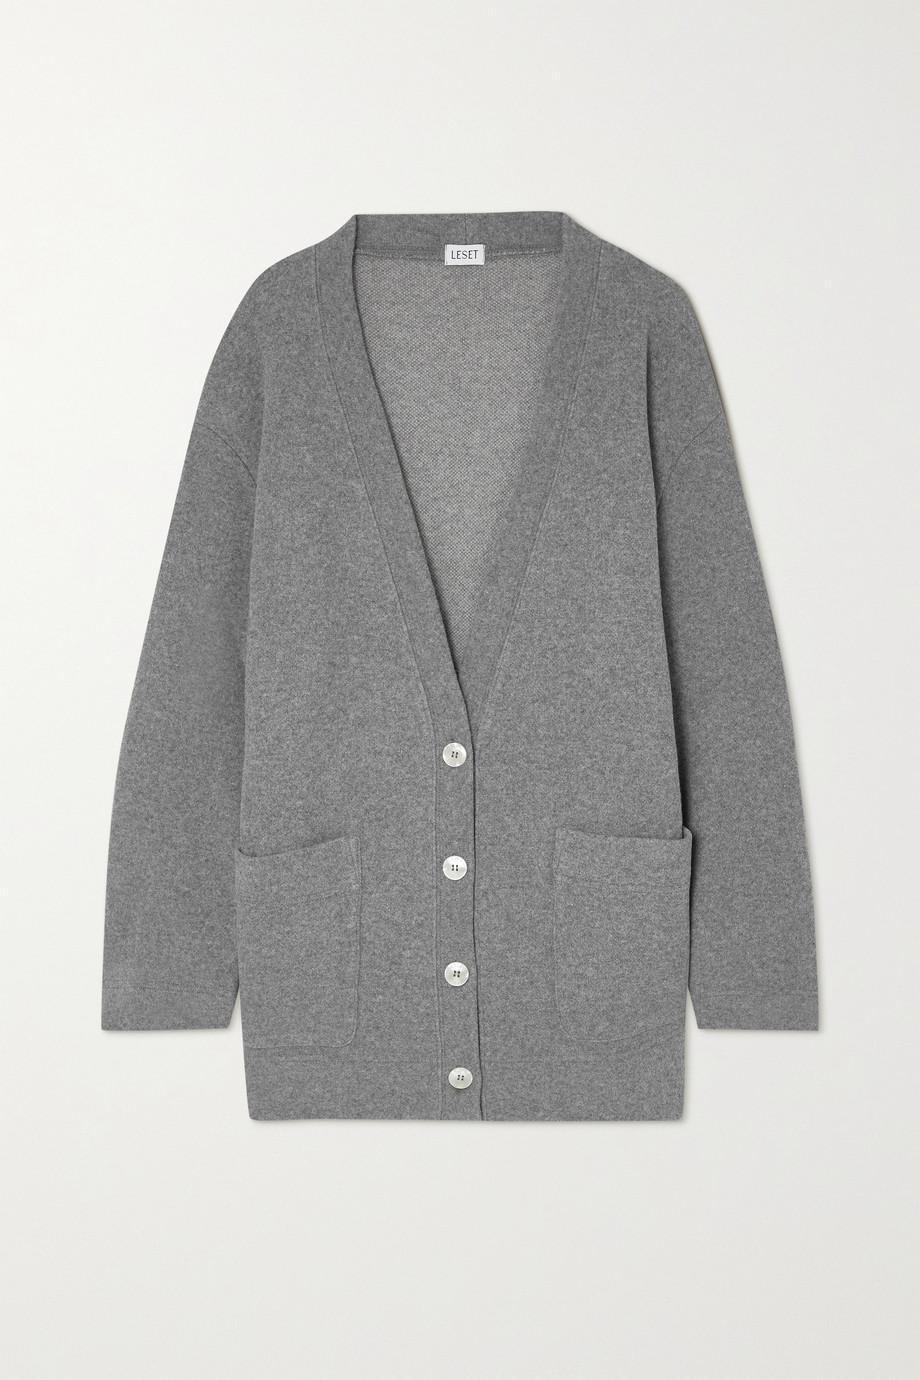 LESET Sienna wool-blend cardigan